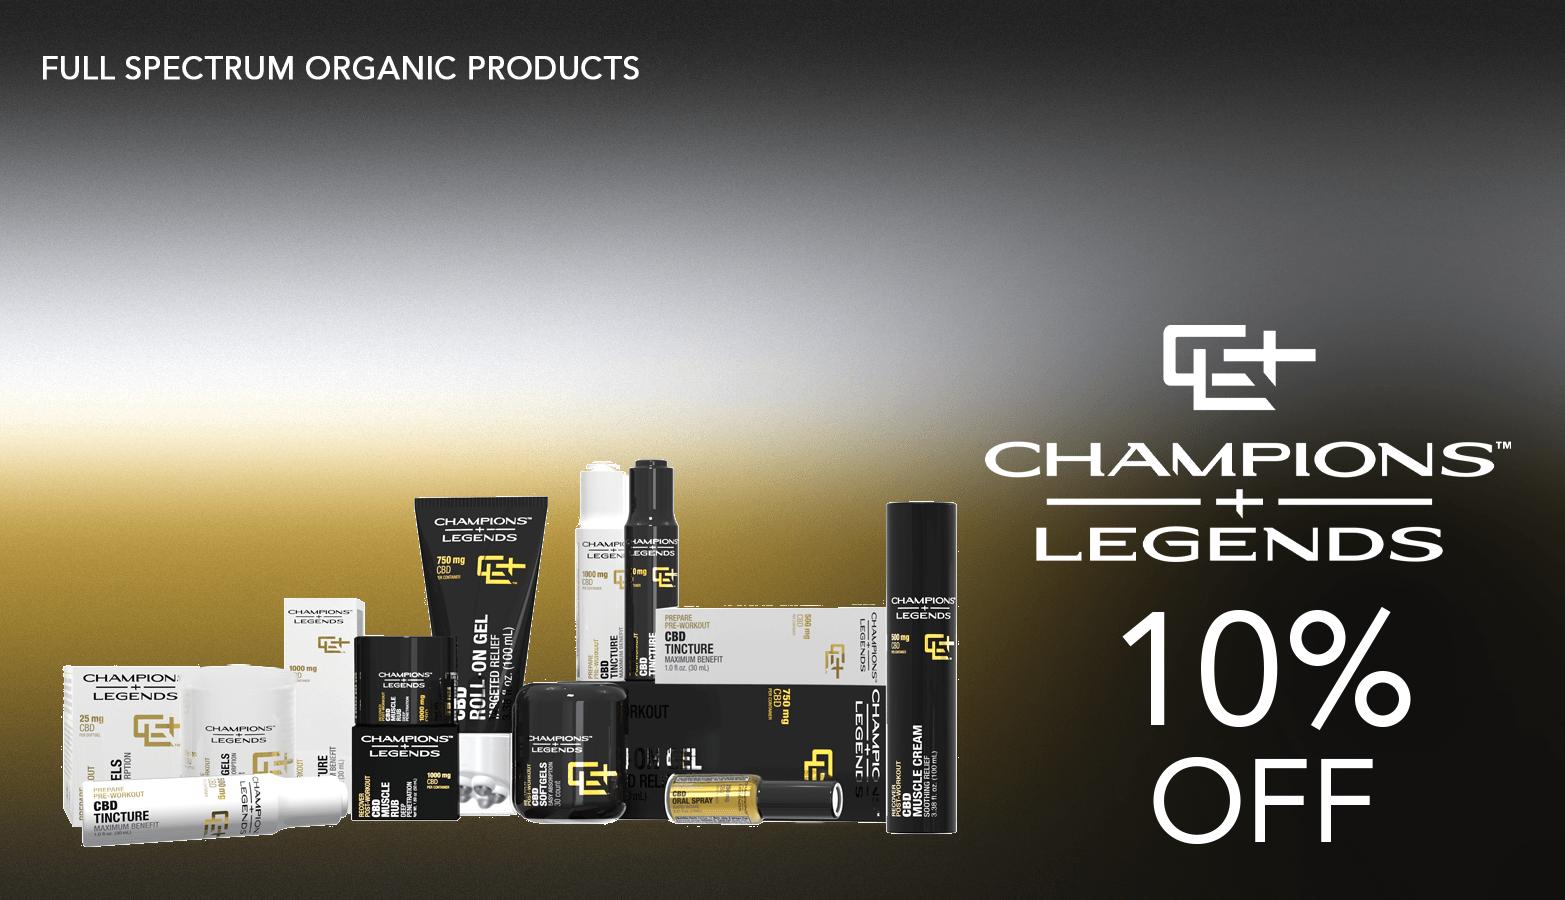 Champions Legends CBD Coupon Code Offer Website